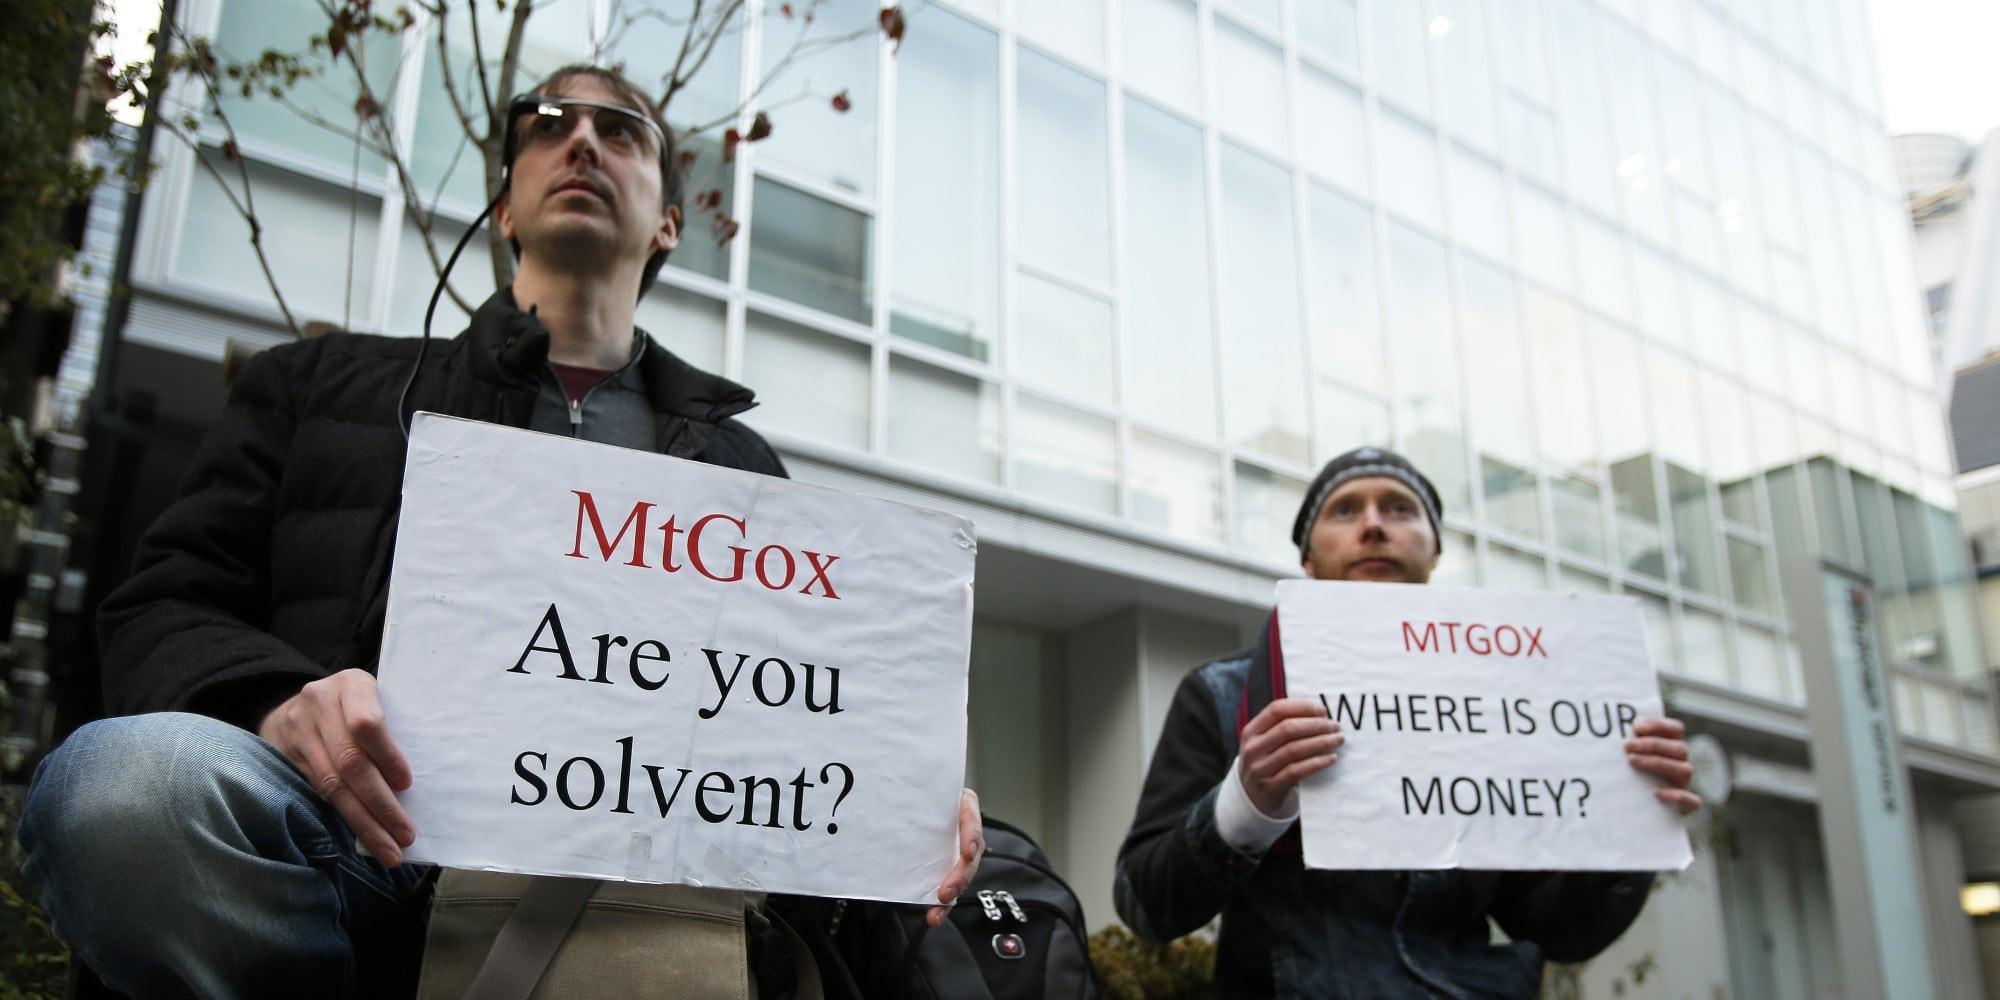 mt. gox odemeleri mt. gox bitcoin btc